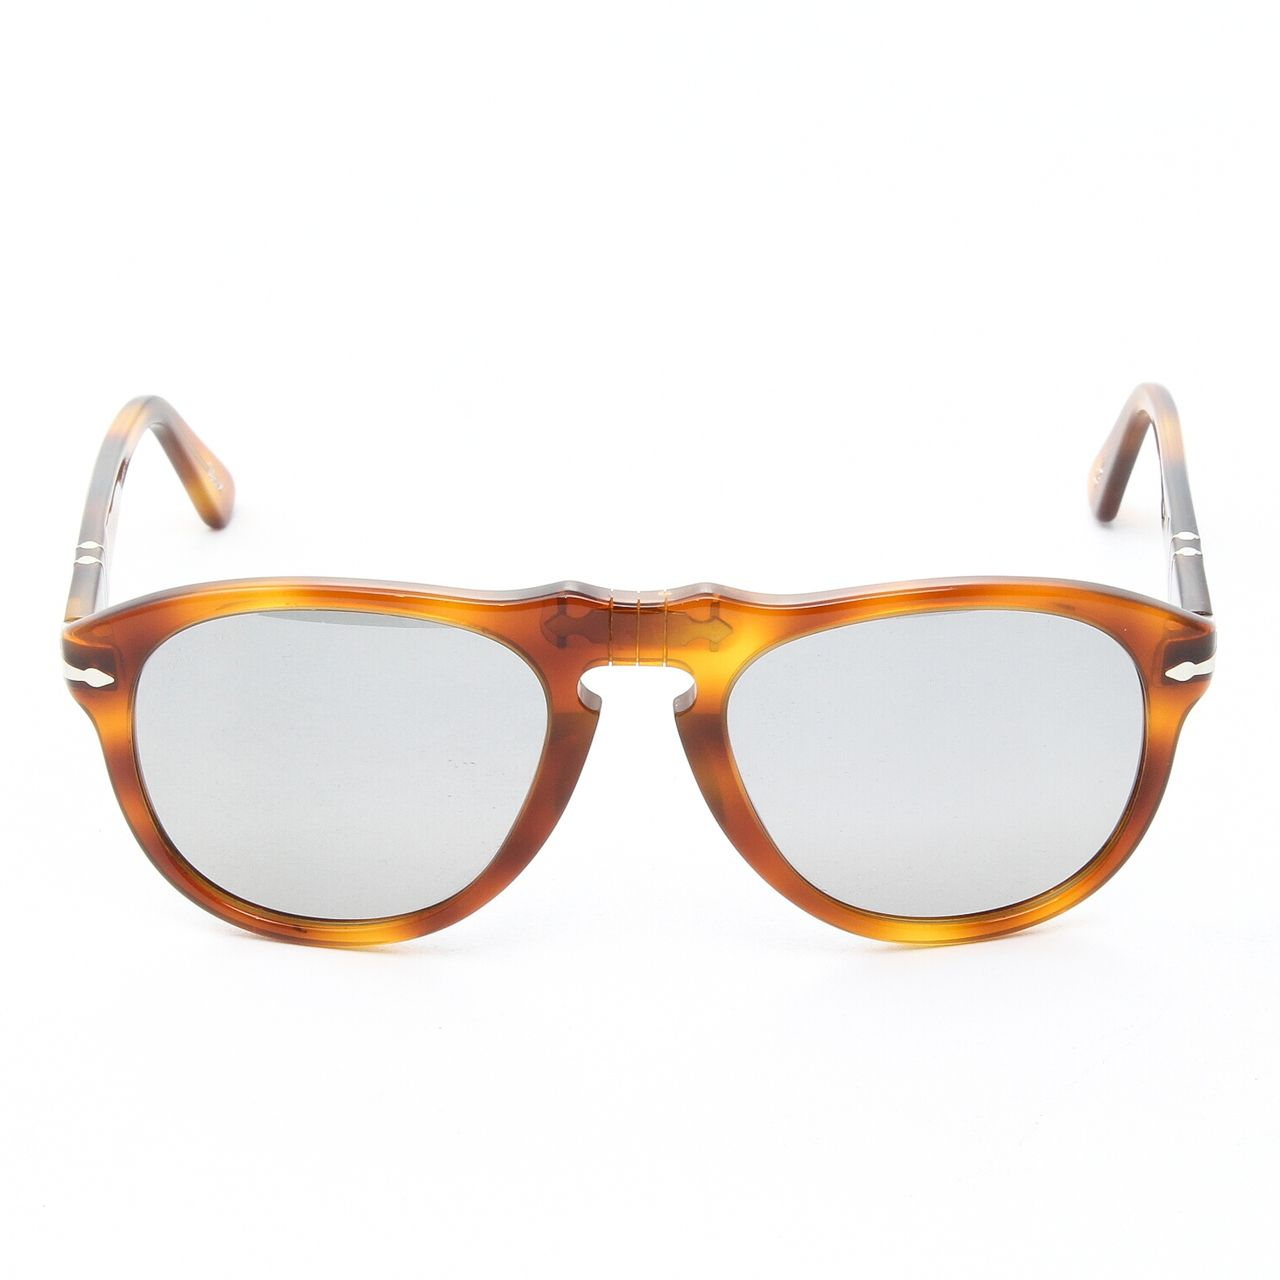 2b47e3eee3 Persol PO0649 96 82 52mm Light Havana Sunglasses with Grey Photochromic  Polarized Lenses - Theaspecs.com